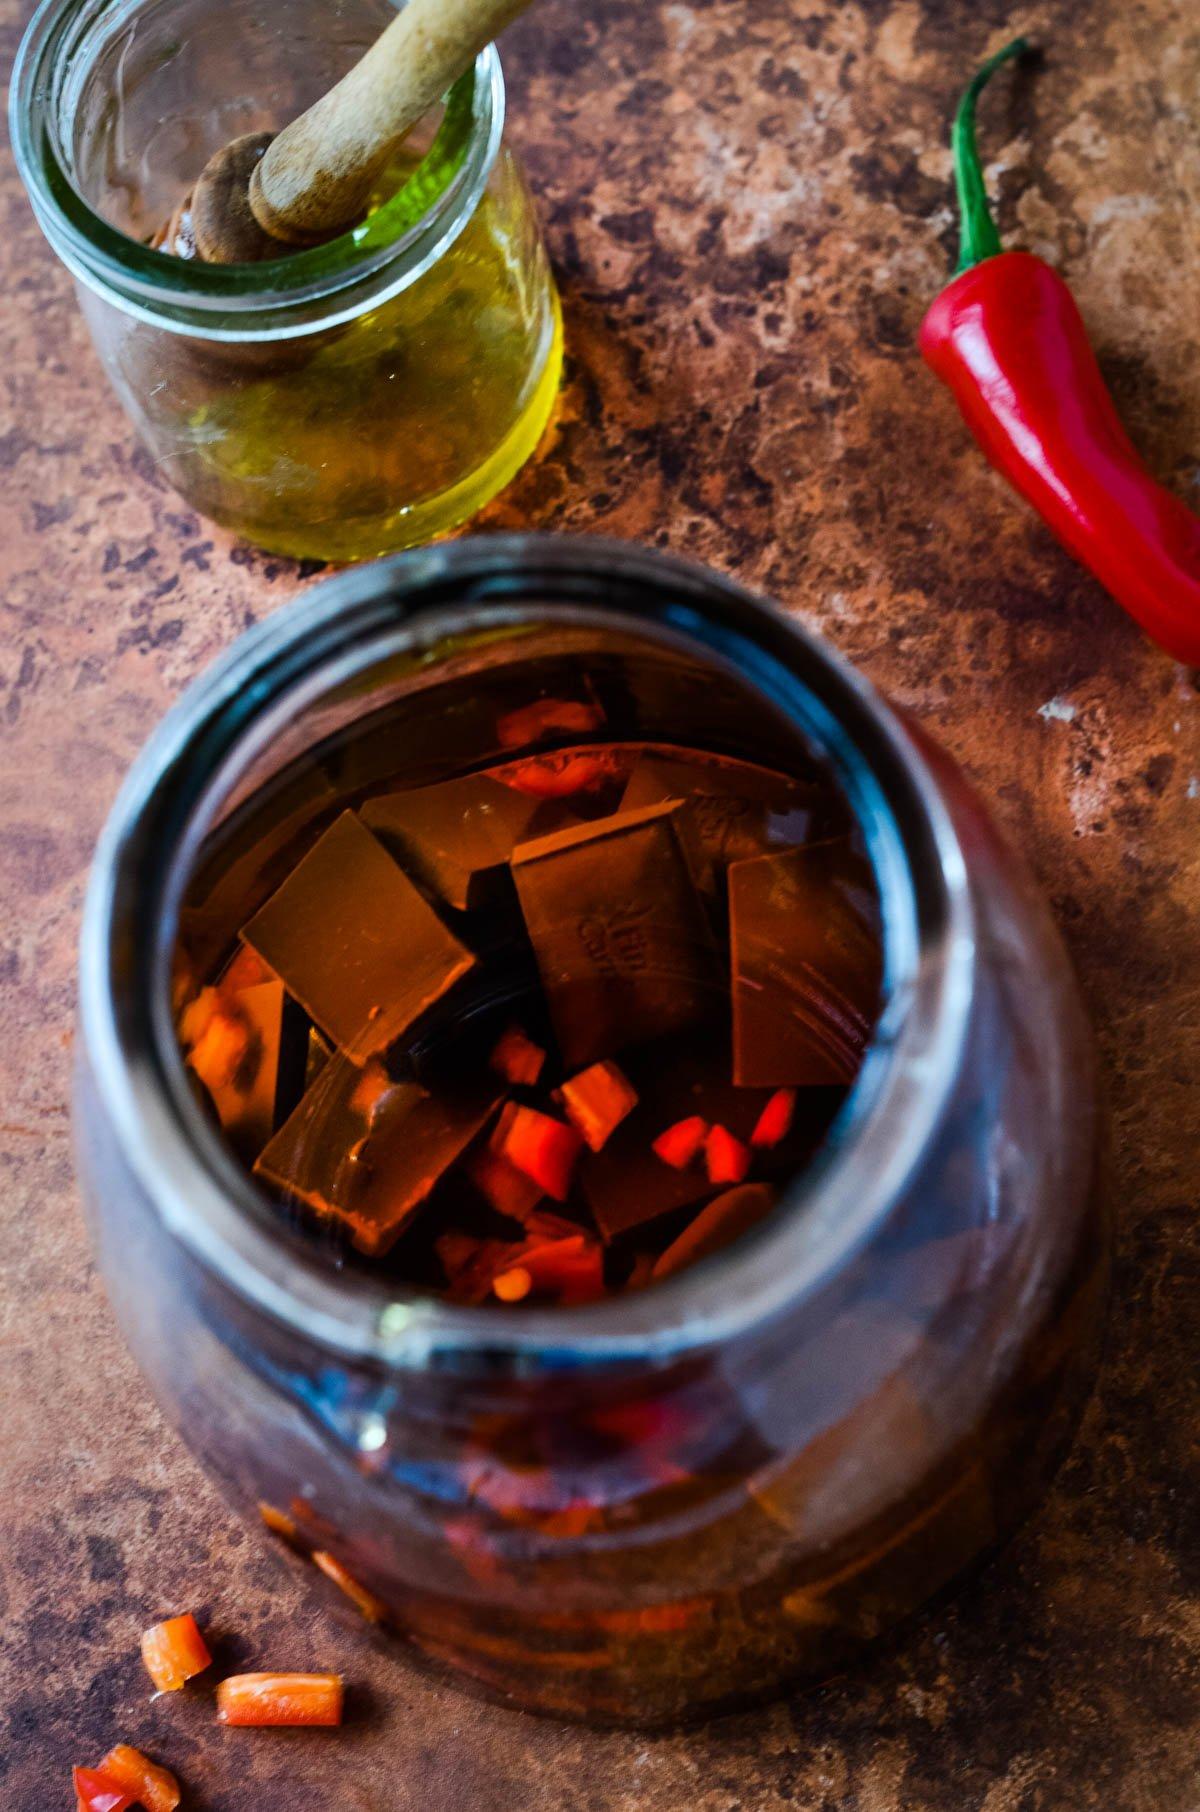 all ingredients for liqueur in jar